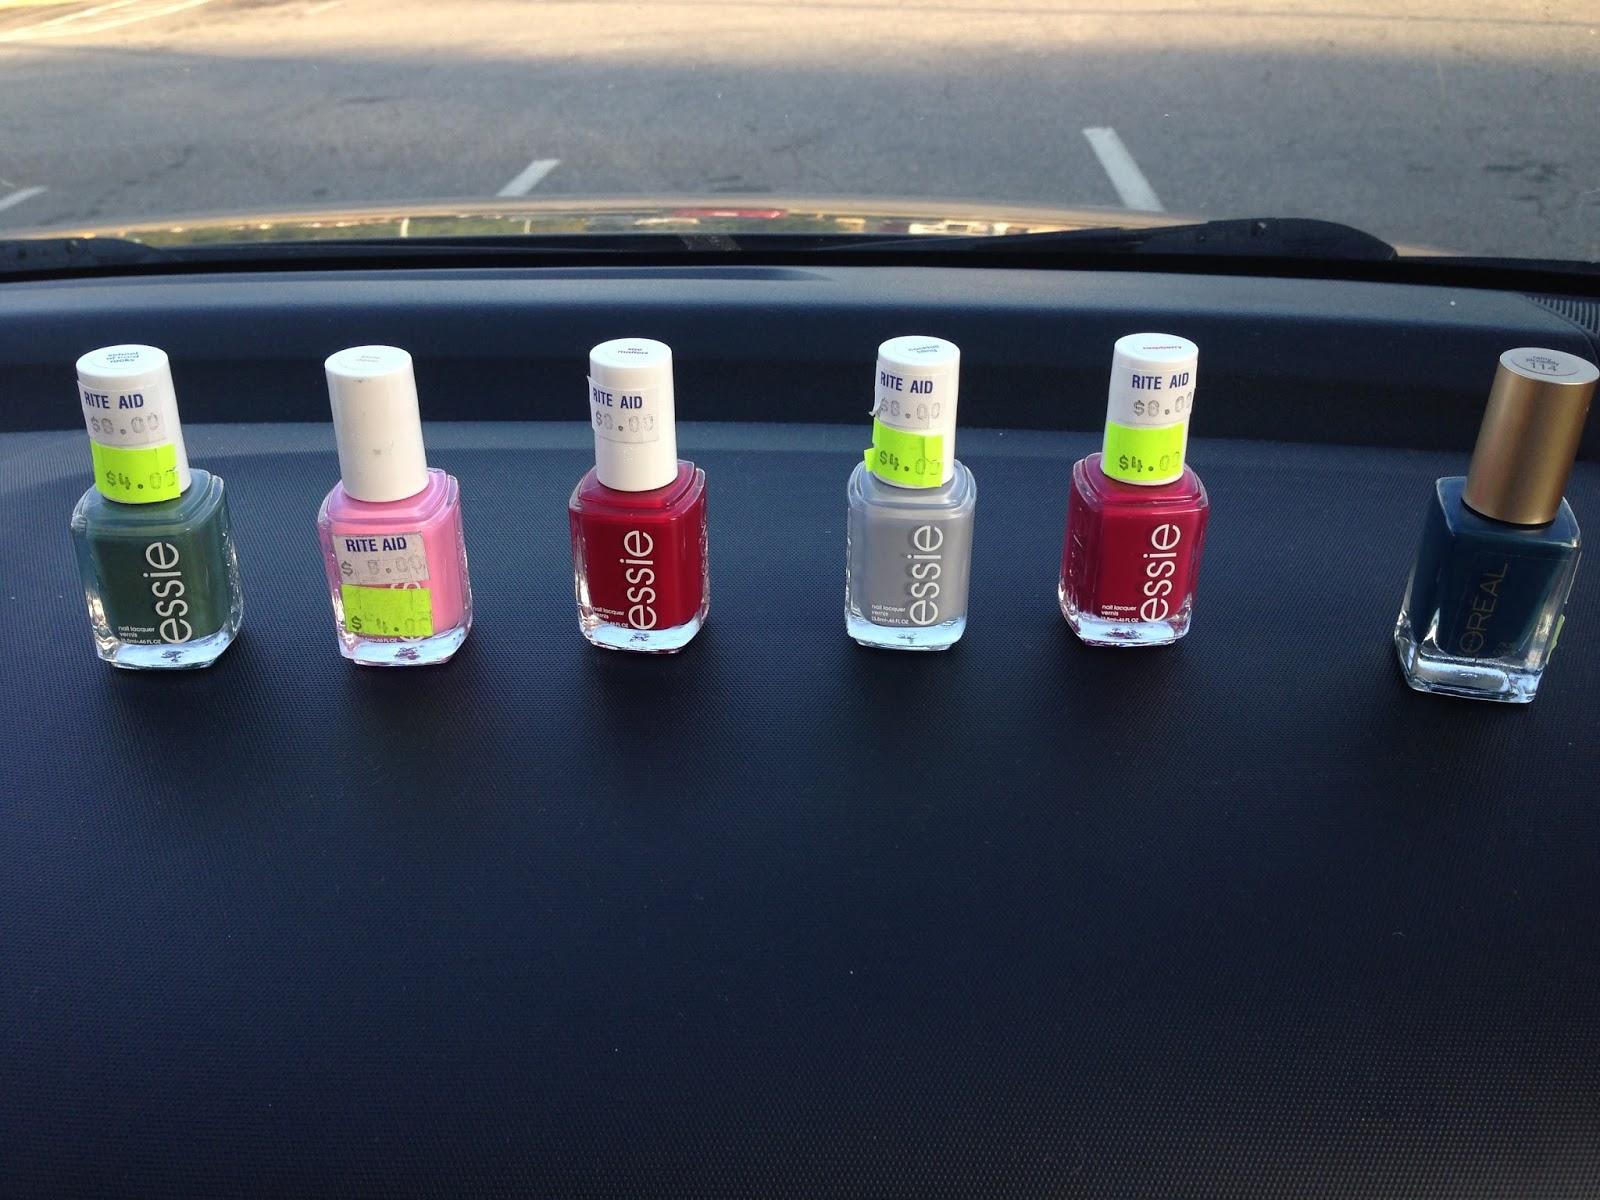 My Beauty Full Blog: Recent Nail Polish PickUps